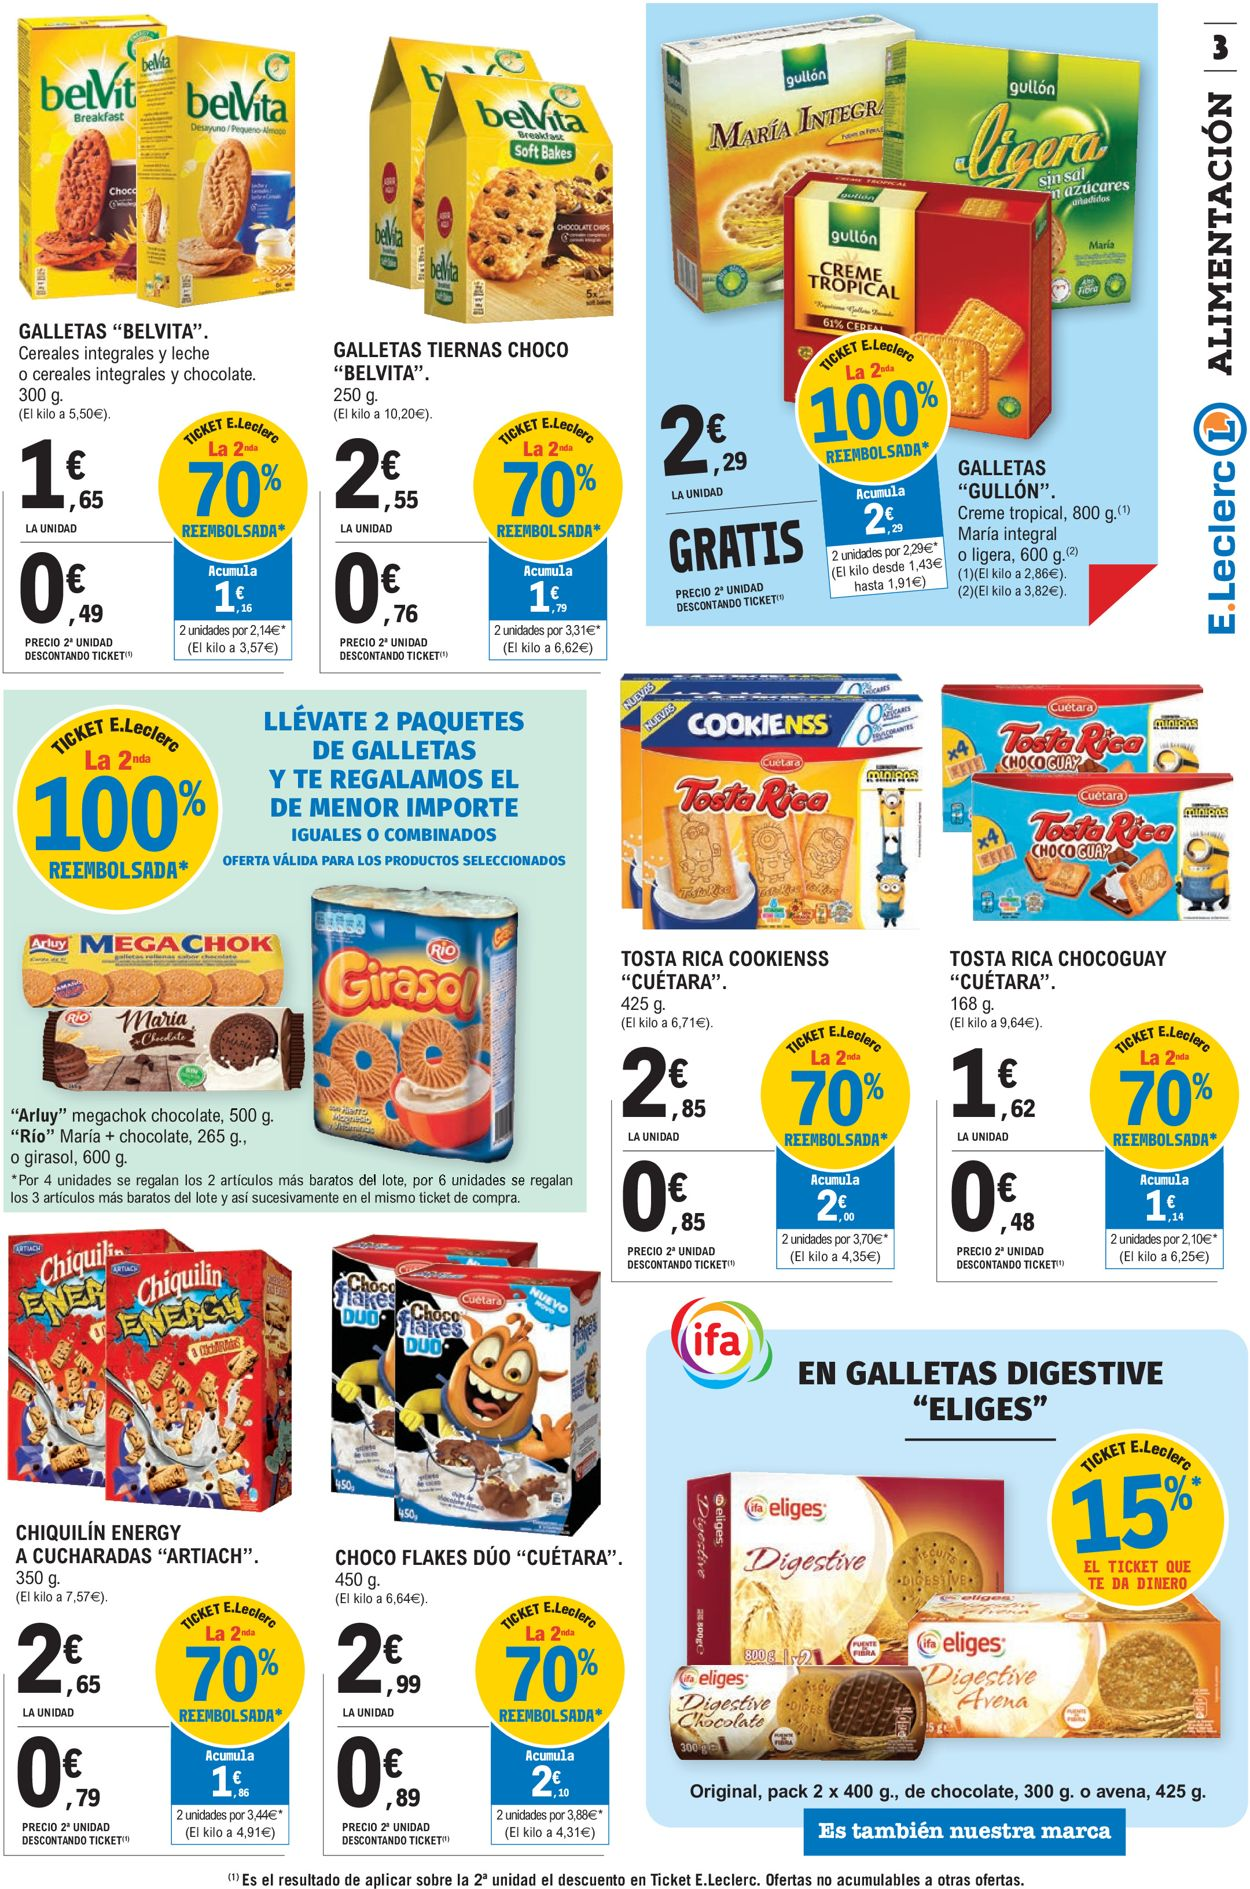 E.leclerc Folleto - 11.11-22.11.2020 (Página 3)